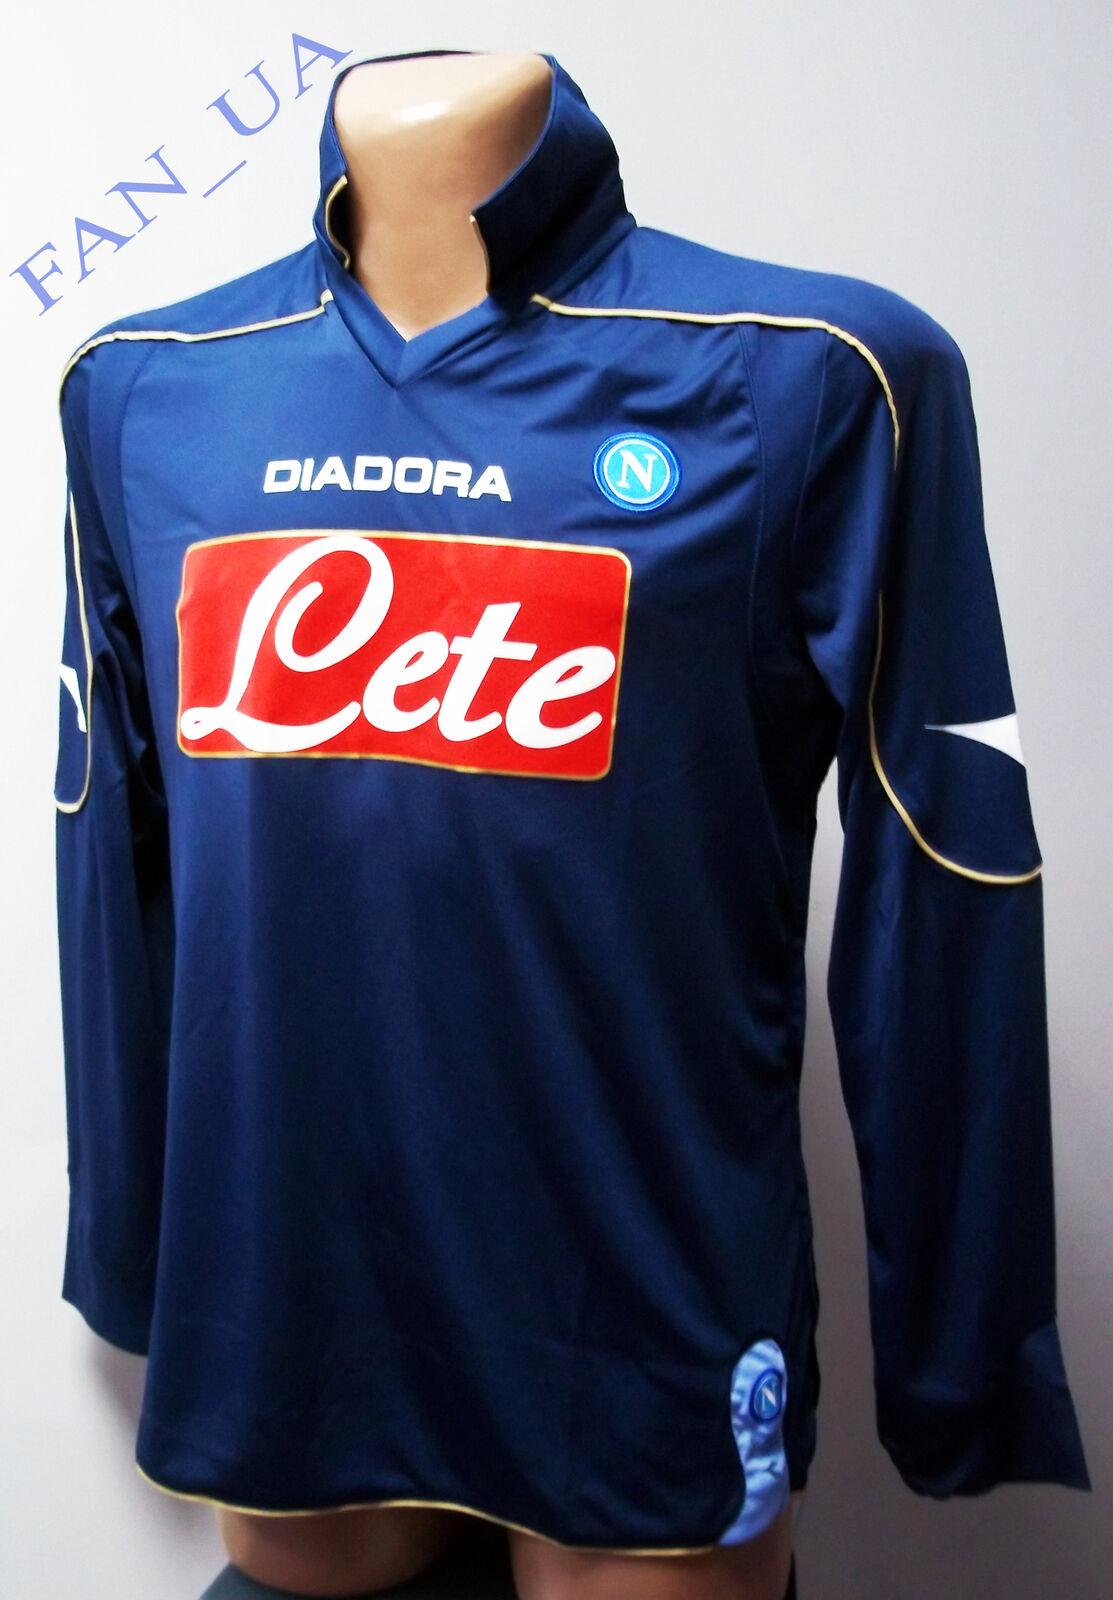 SHIRT Maglia CALCIO SSC Napoli MATCH WORN Jersey diadora Camiseta 2008 2009